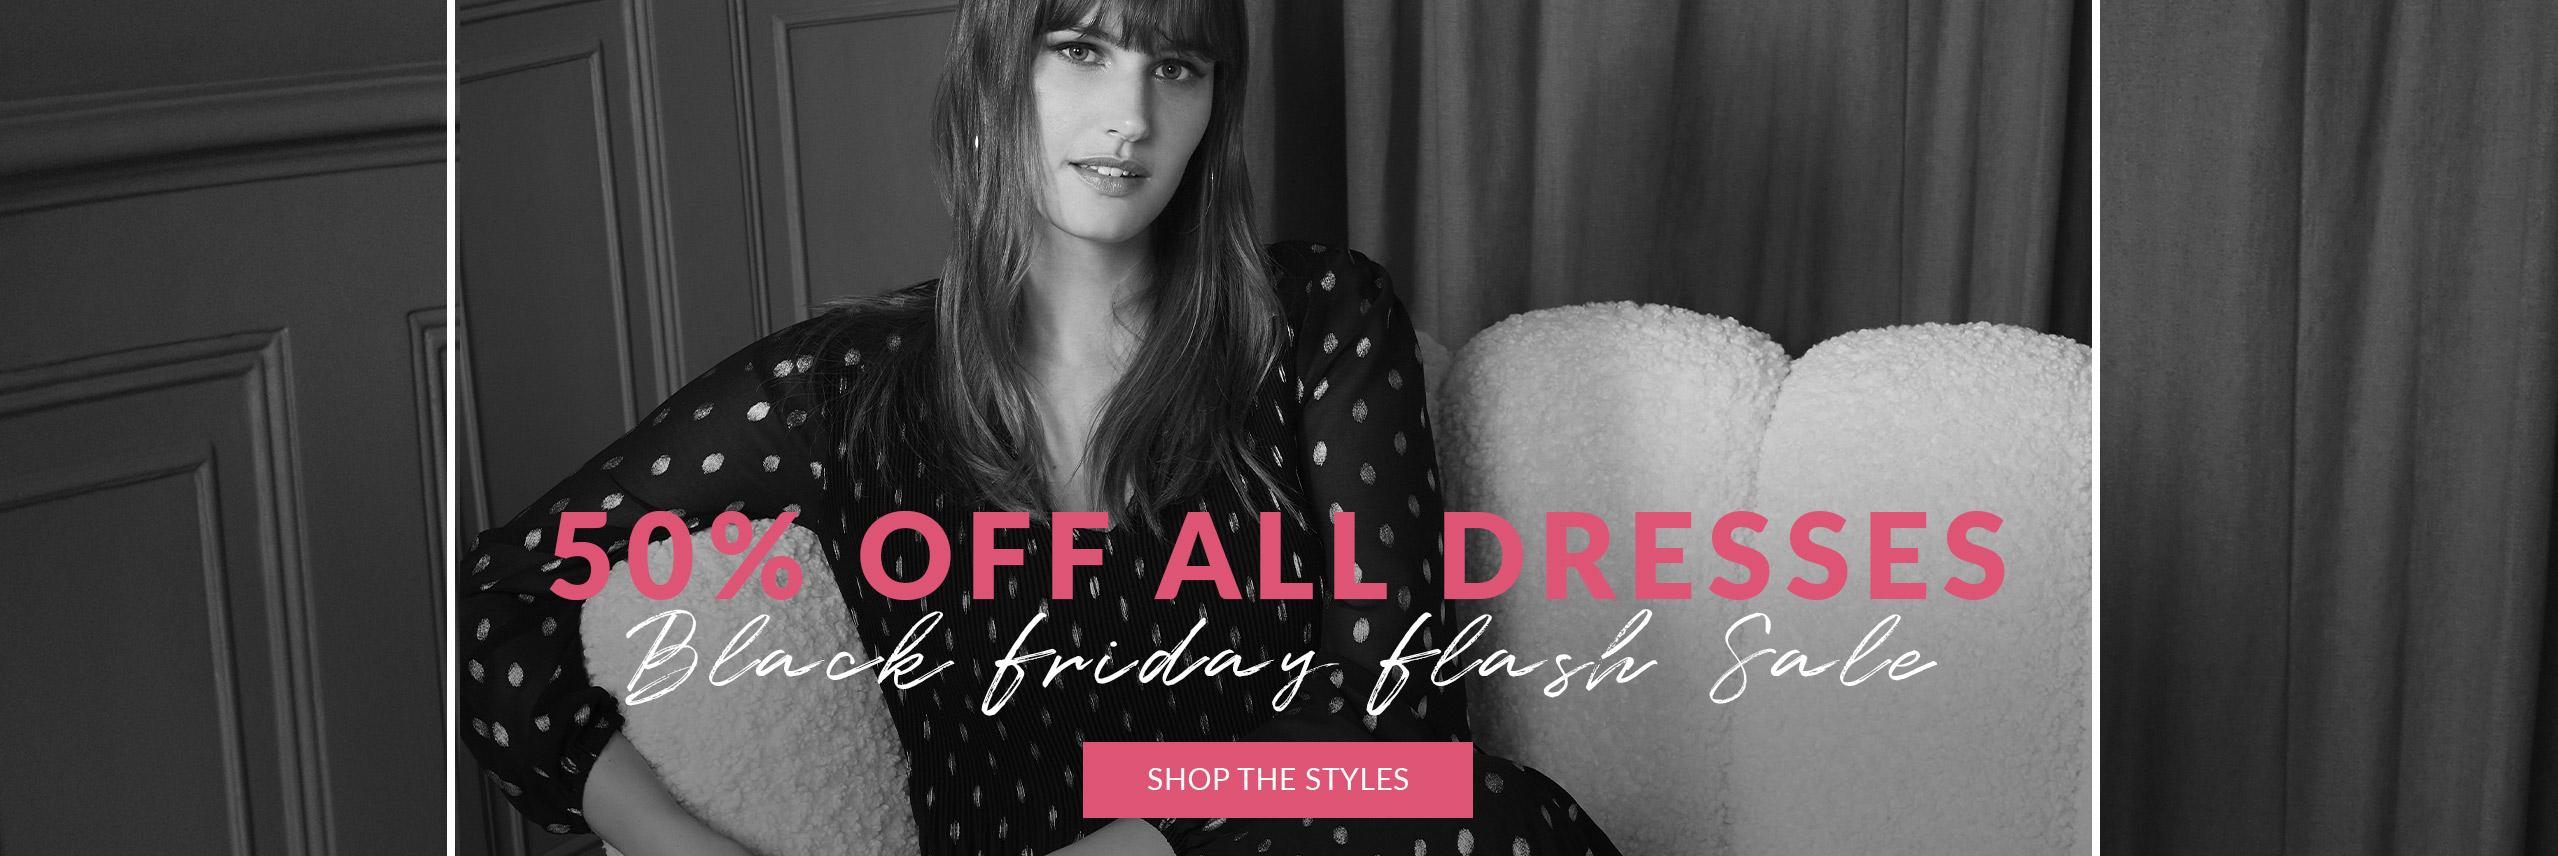 Black Friday 25% off All Dresses